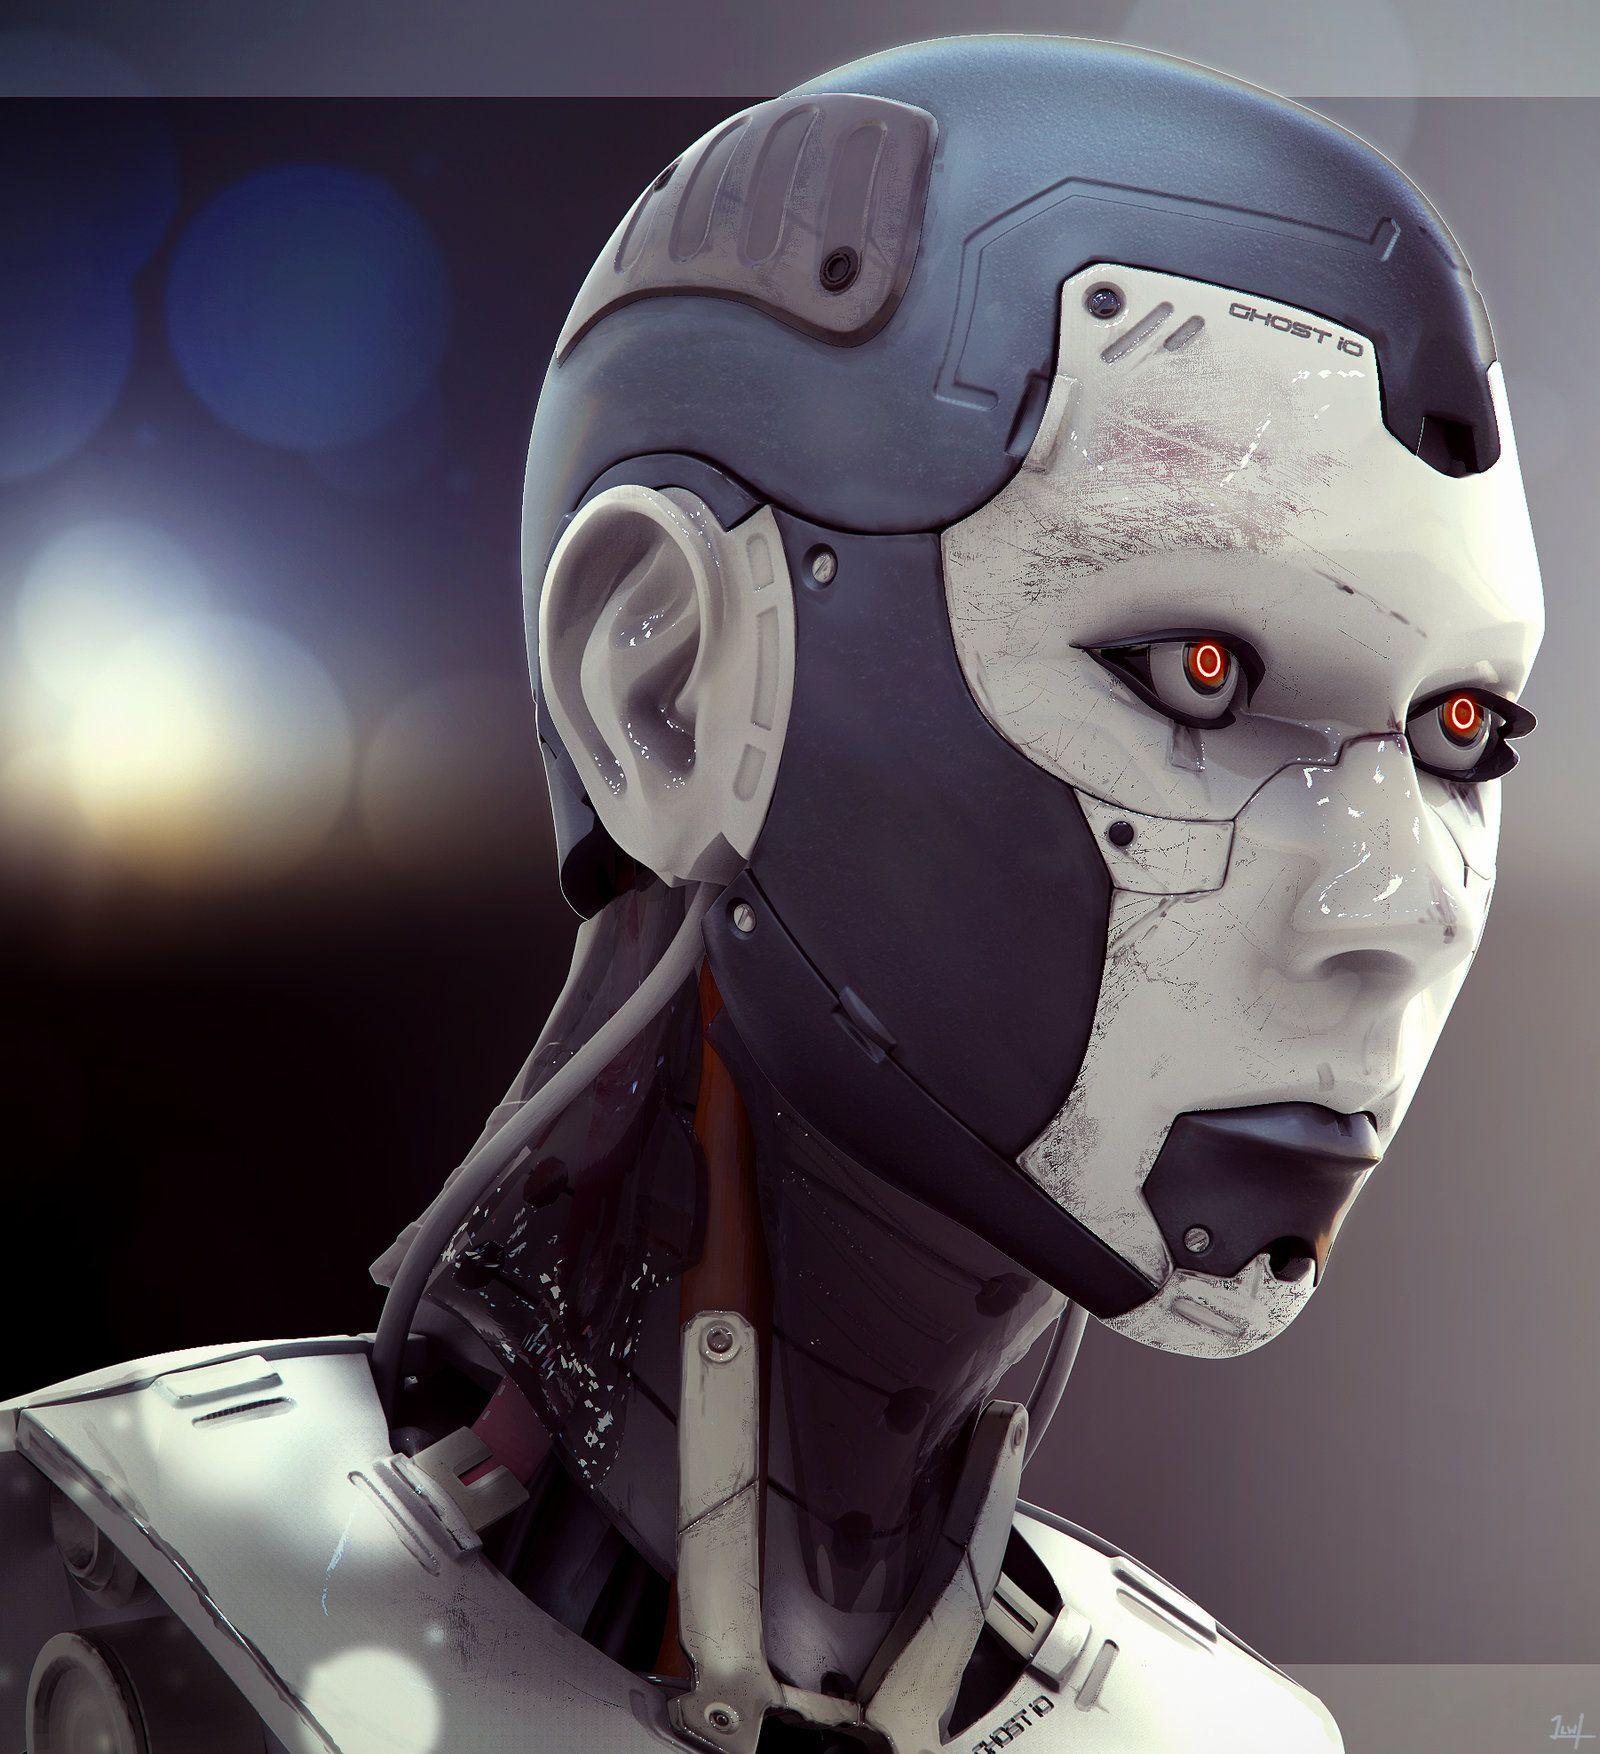 Cyborg Female Composite, 2014 Lance Wilkinson www